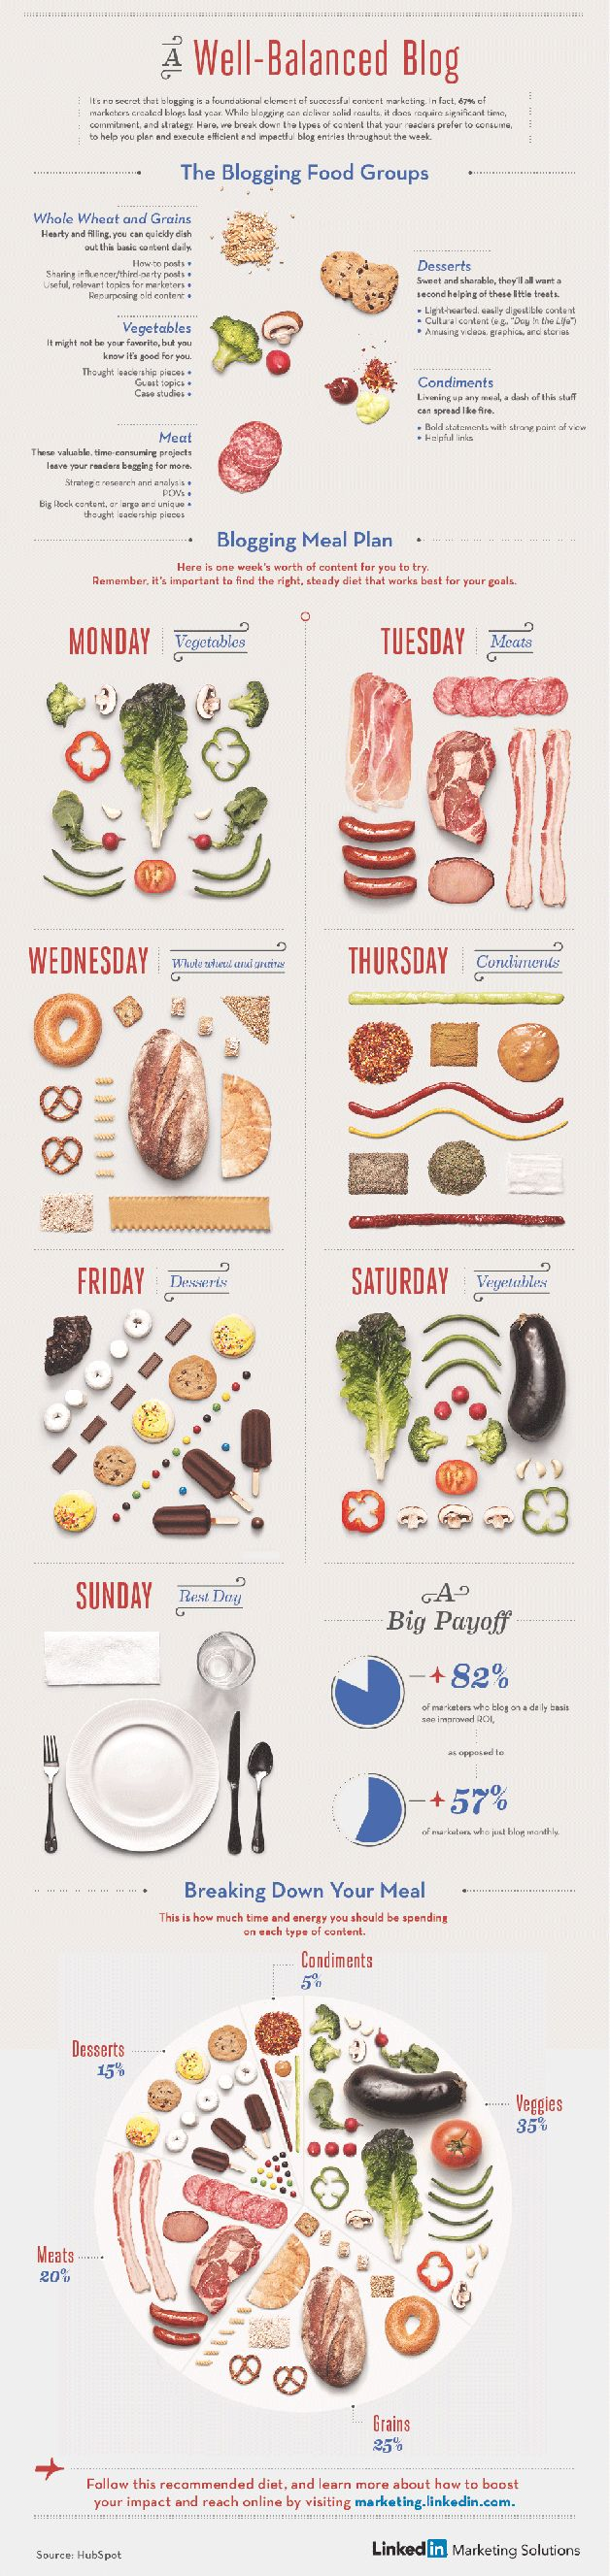 Infographic design from design studio Column Five